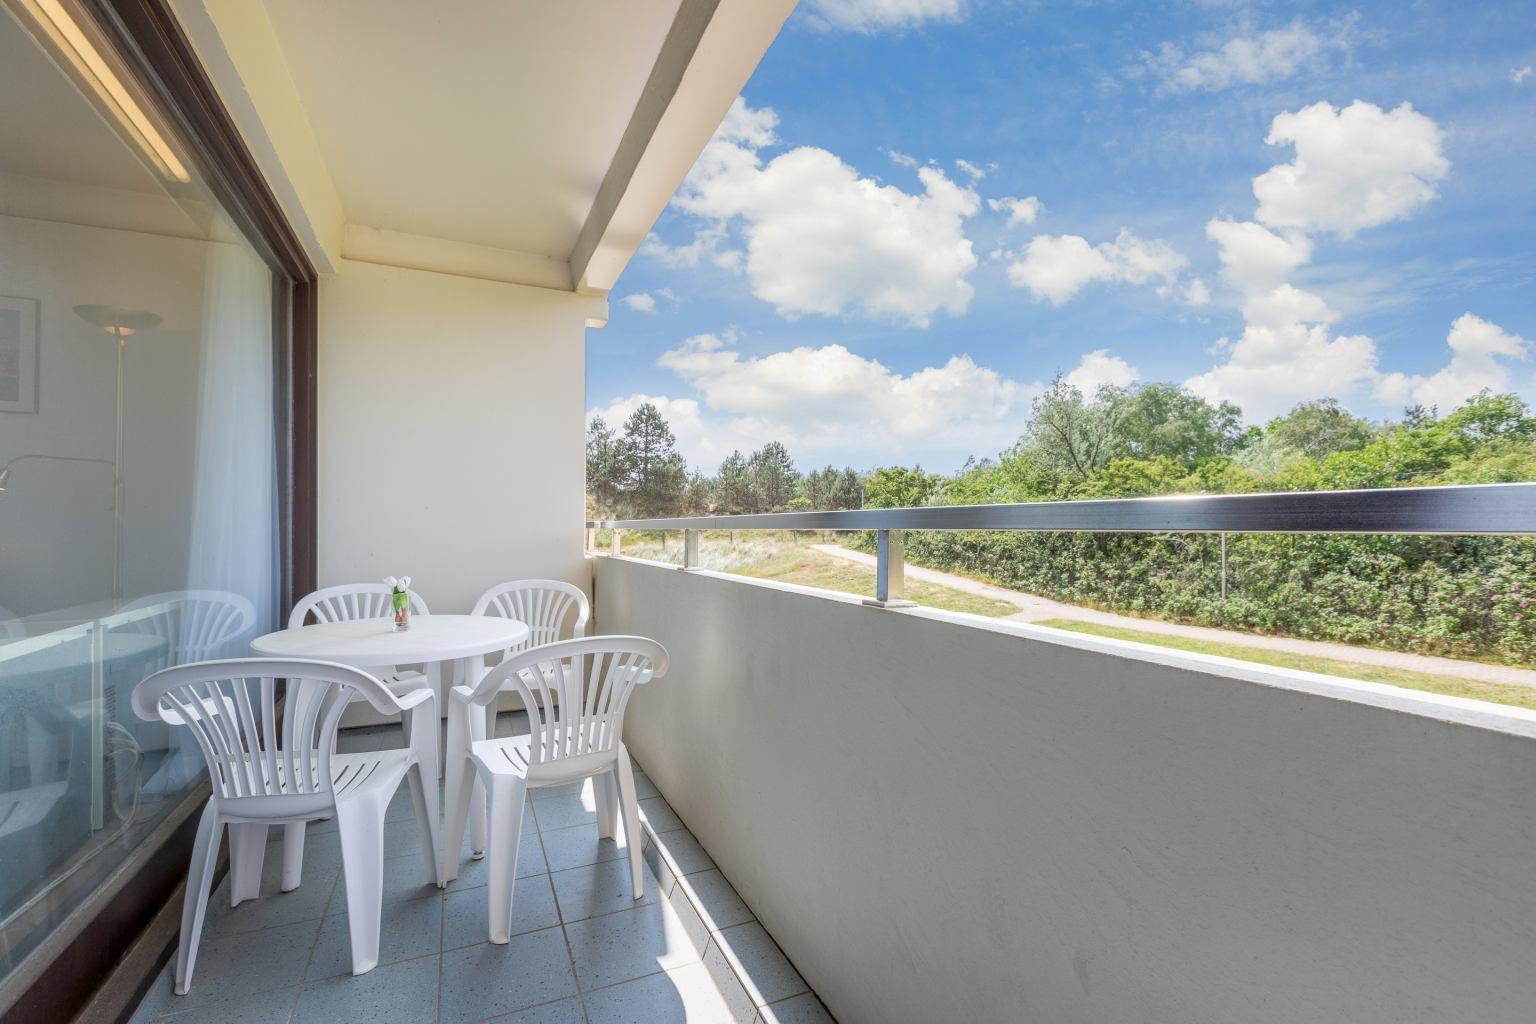 Balkon, Ferienwohnung 5, St Peter Ording Bad, Haus Atlantic,  Alter Badweg 11-15